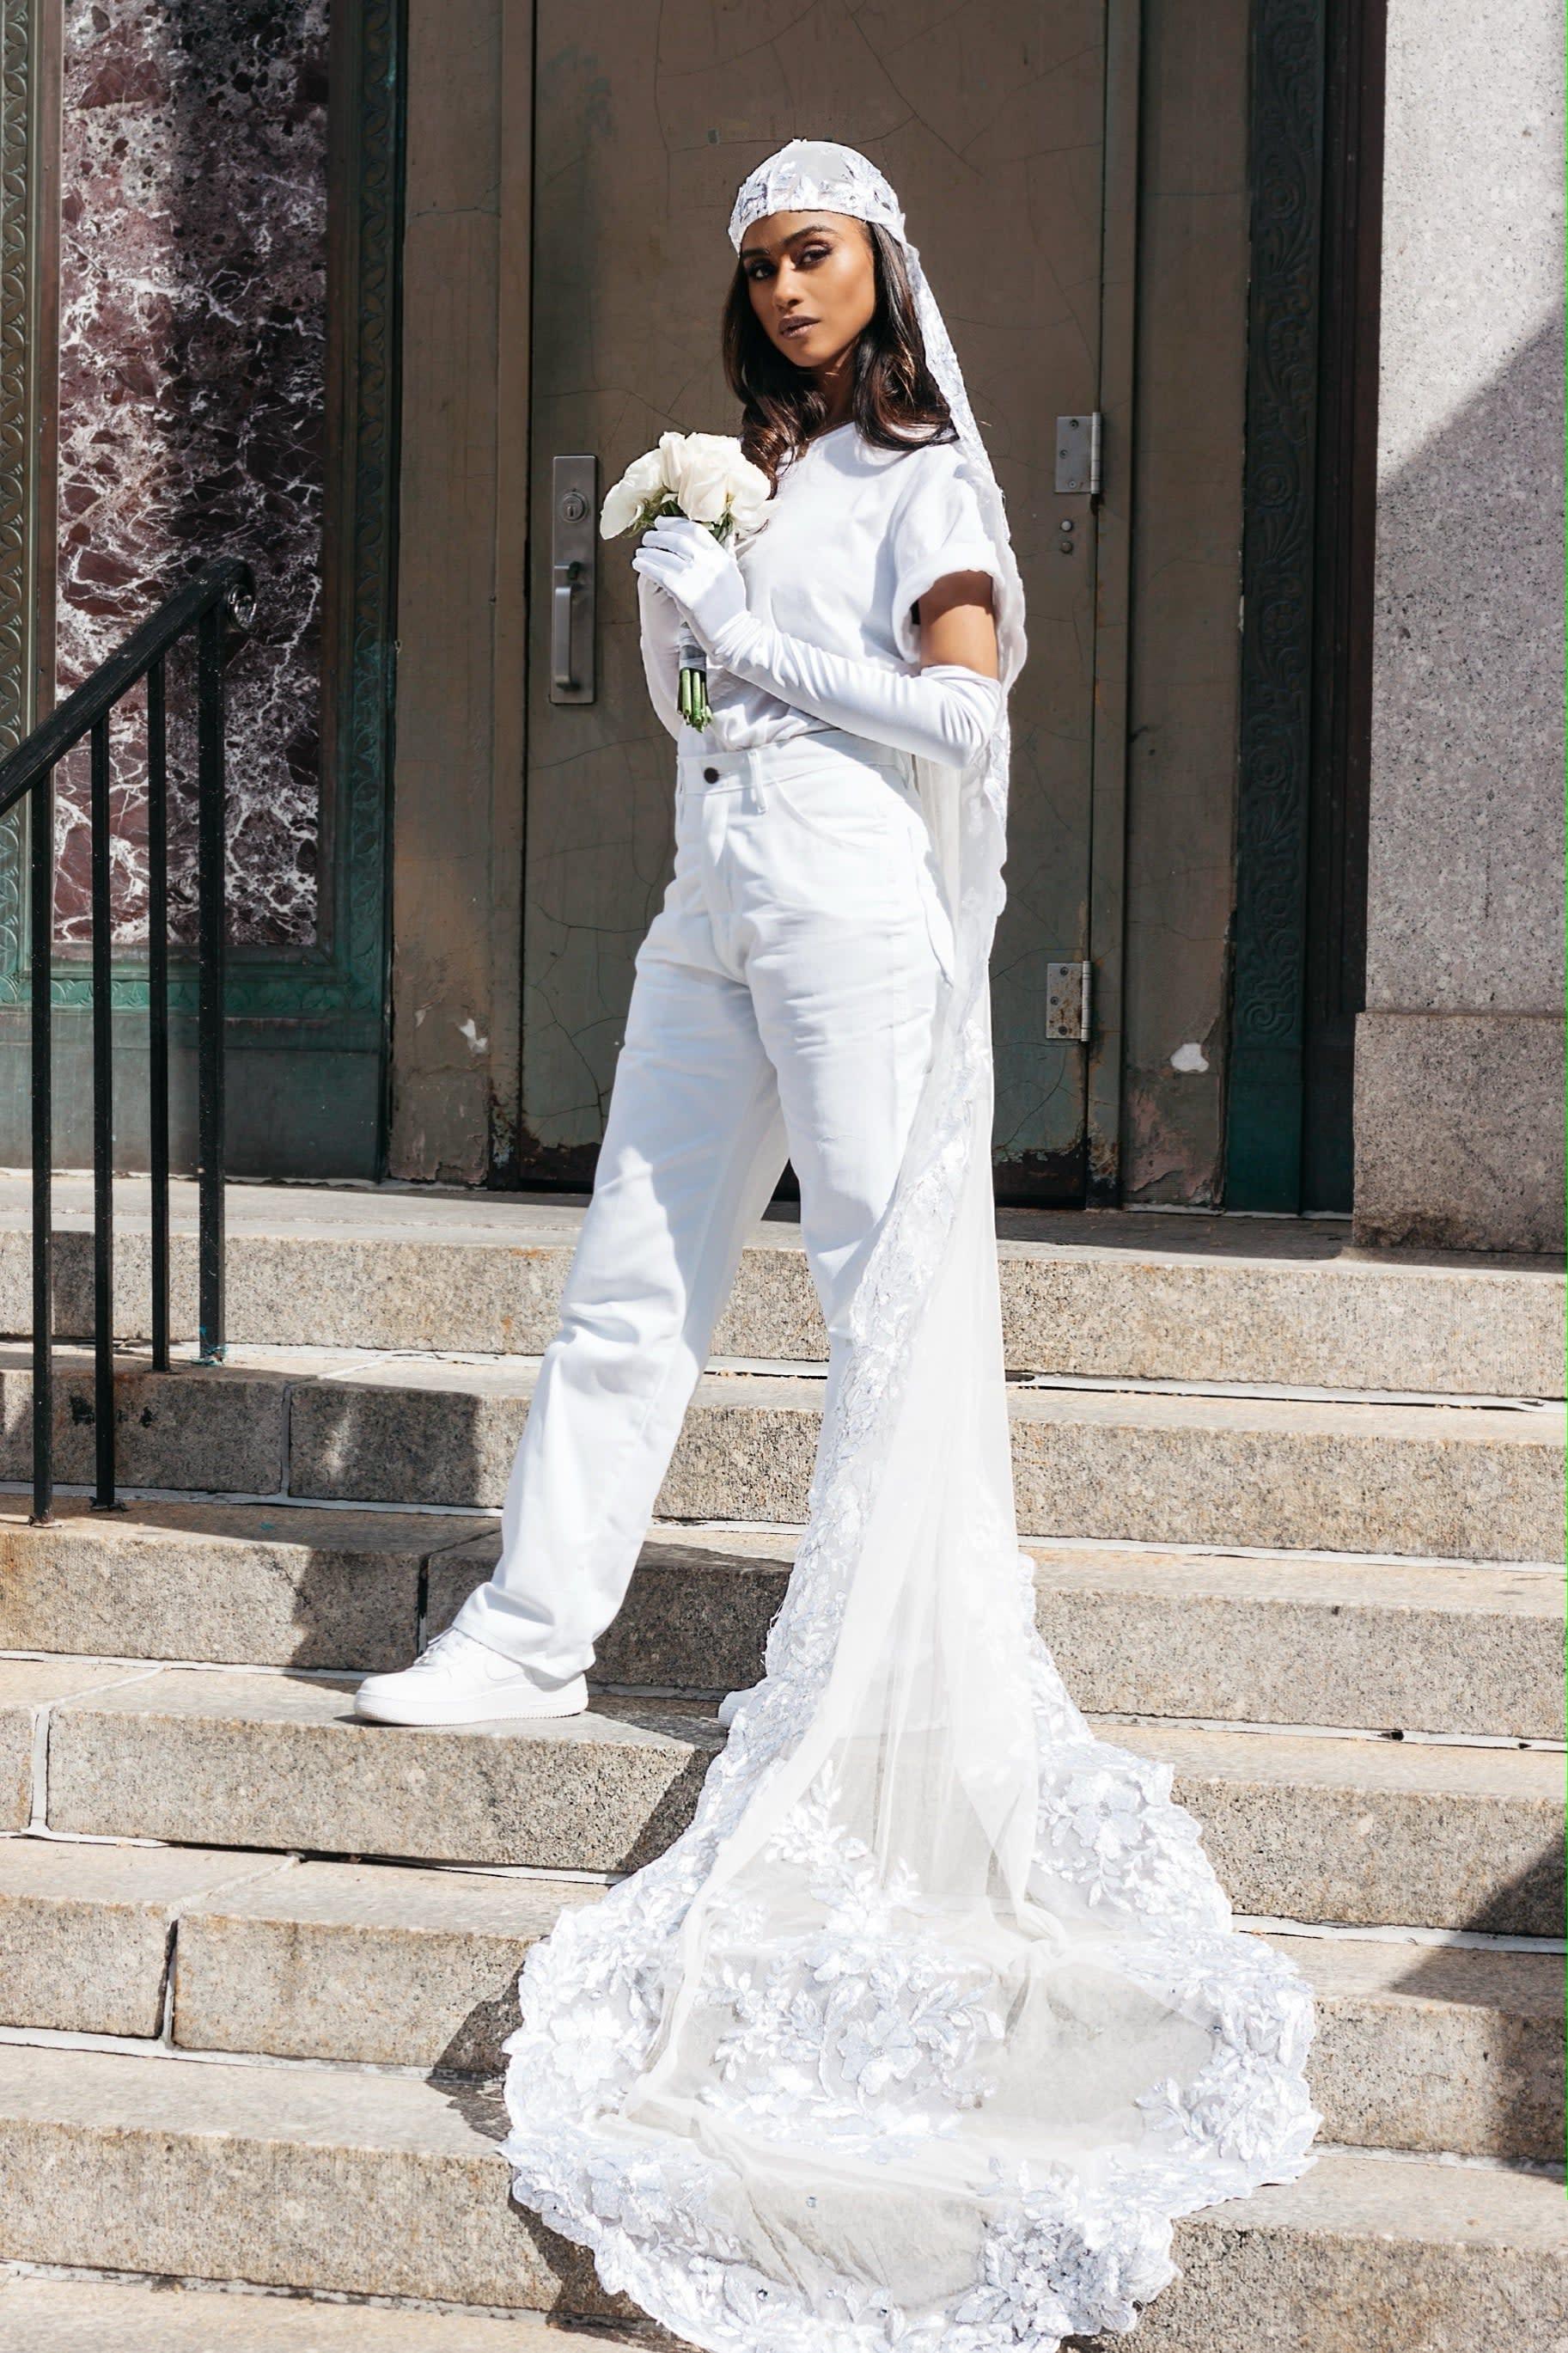 Vashtie Wore A Custom Durag Veil For Her City Hall Wedding To Honor Black Culture,Short Wedding Guest Dresses For Summer